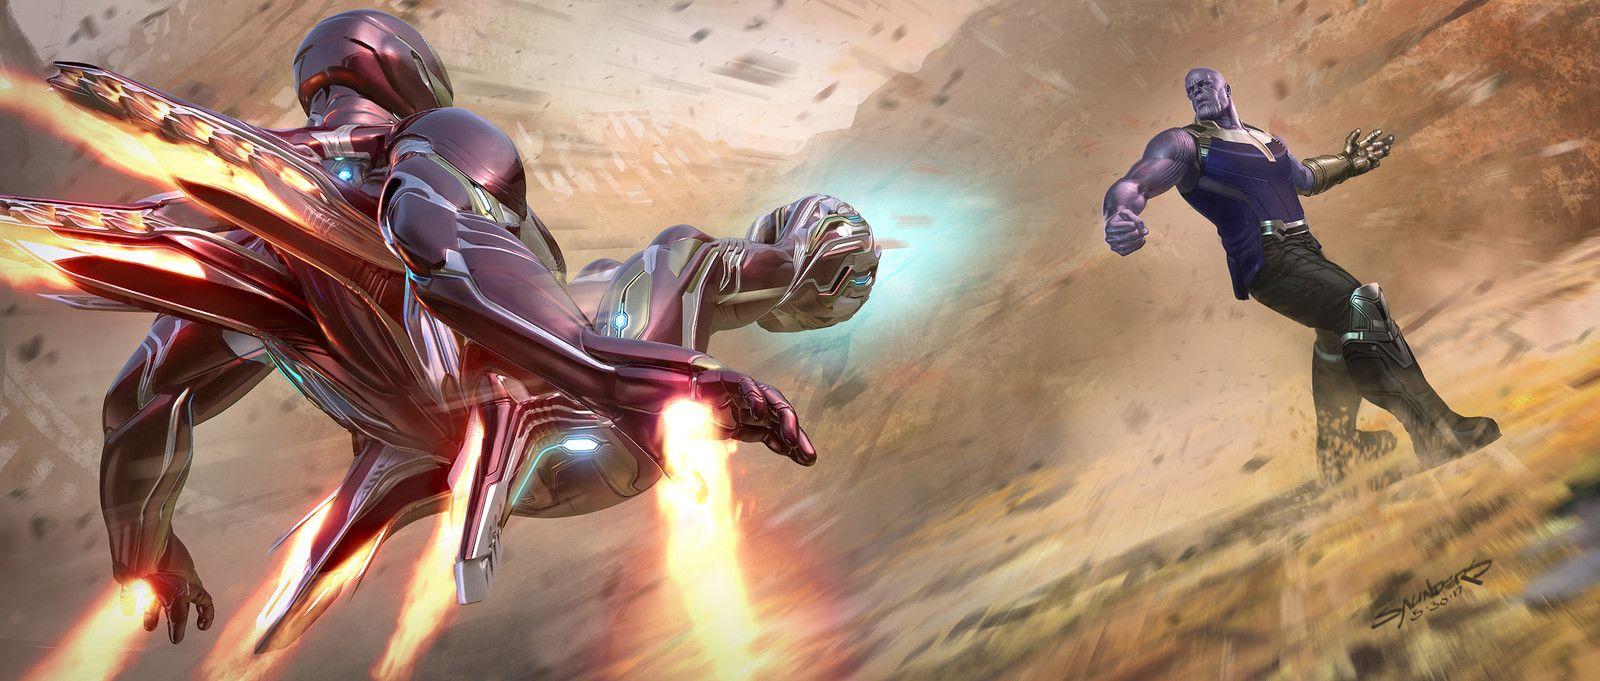 Avengers Infinity War 2017 Iron Man Mk50 Vs Thanos On Titan Keyframe Phil Saunders On Artstation At Https W Star Citizen Concept Art Concept Art World